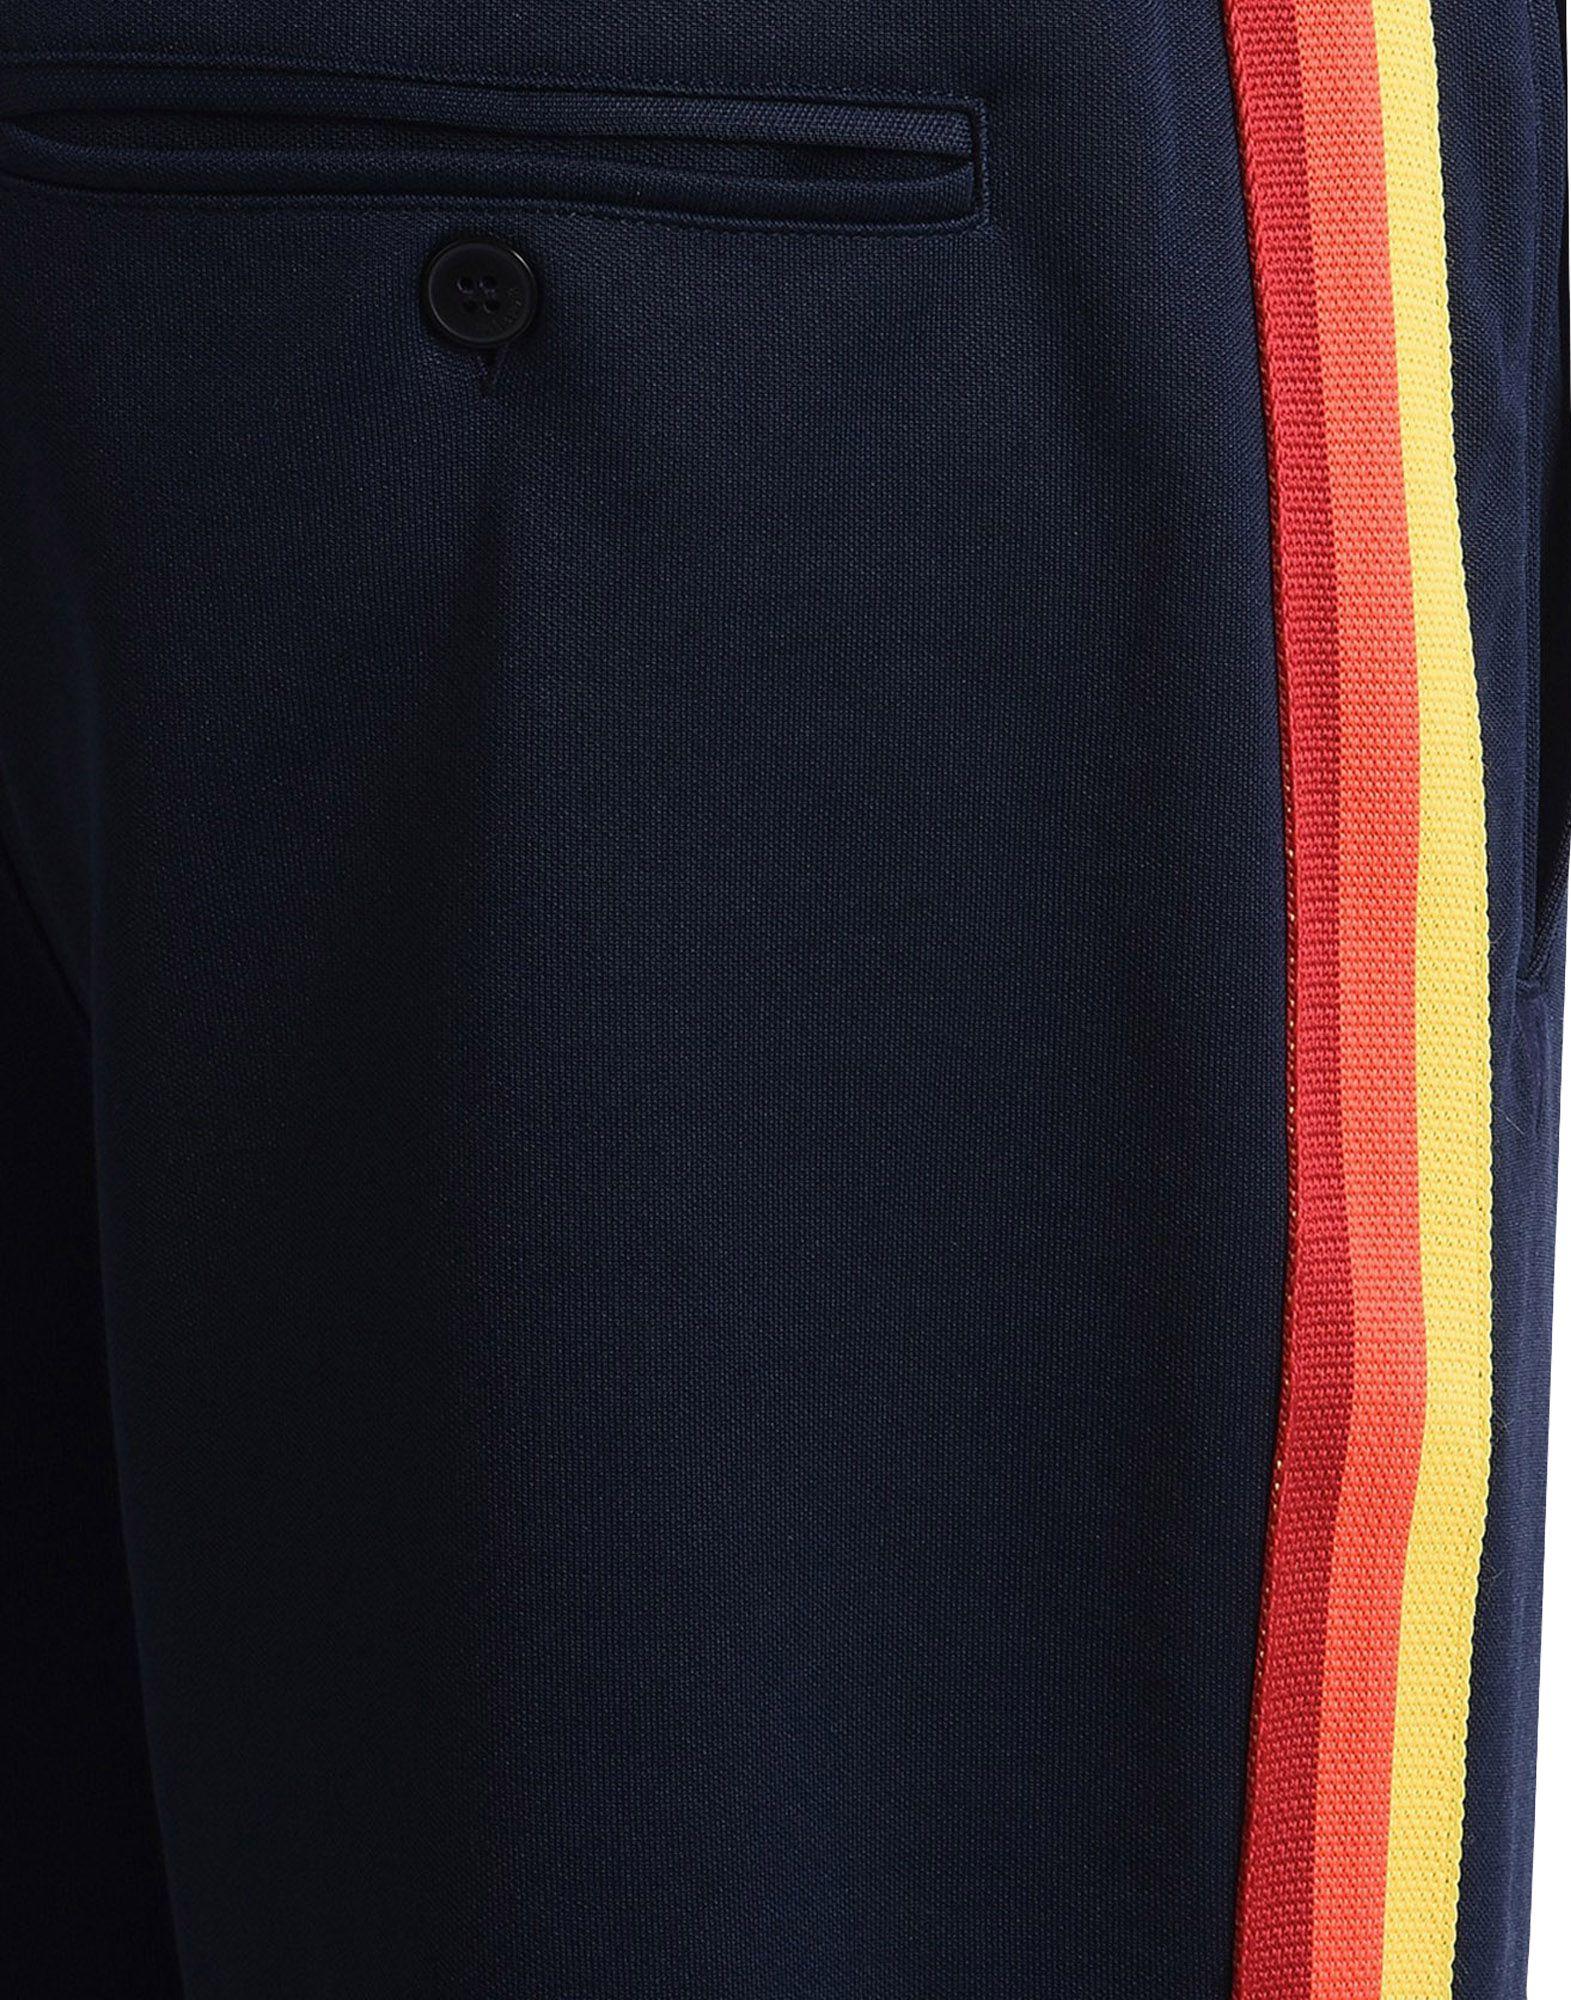 Pantalone - Just Cavalli Uomo - Pantalone 13136870WI d3d650